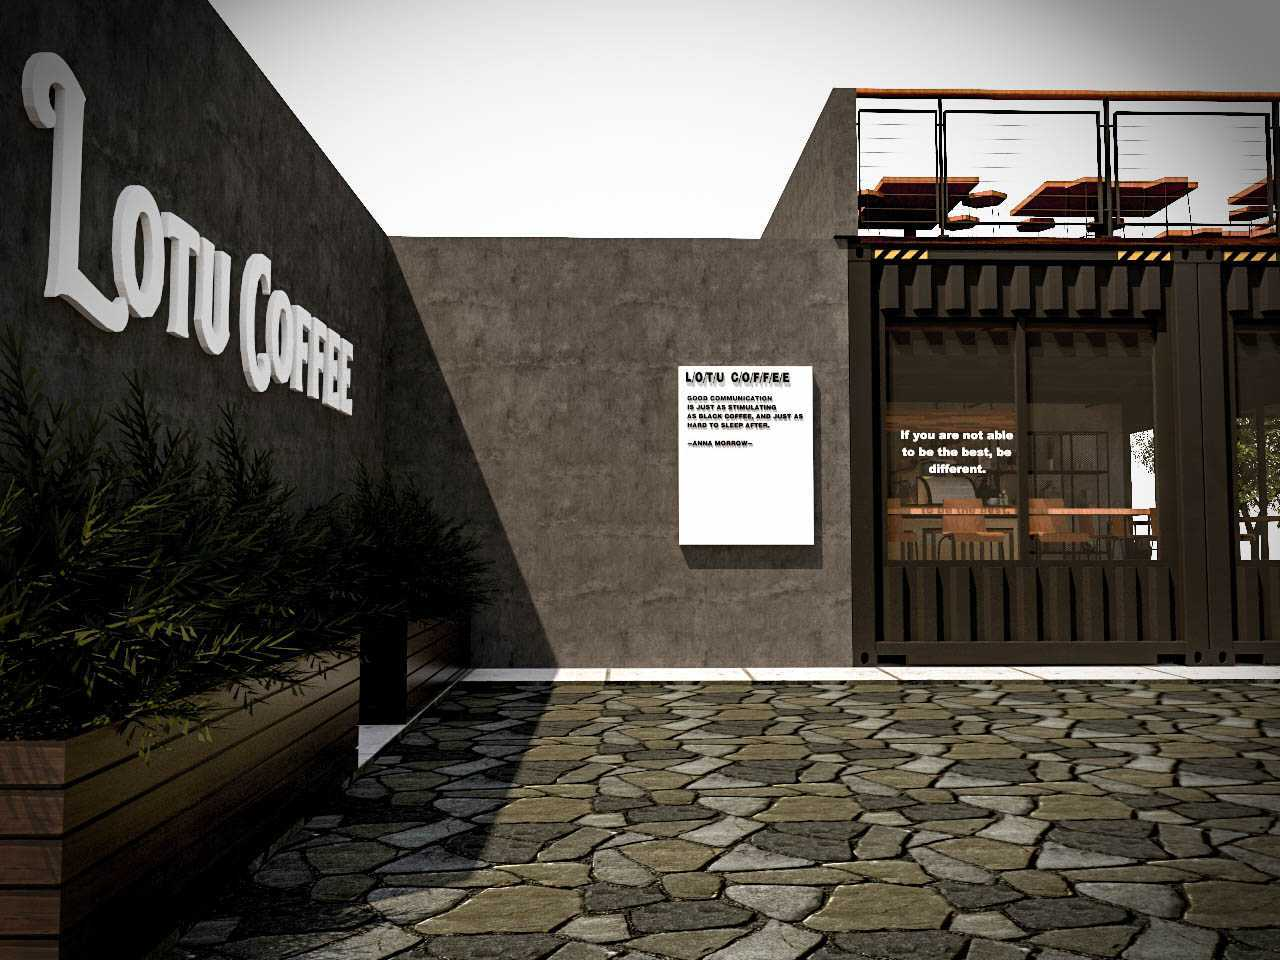 Arch Studio Indonesia Lotu Coffee & Gelato Jl. Ciliwung No.11, Cihapit, Kec. Bandung Wetan, Kota Bandung, Jawa Barat 40114, Indonesia Jl. Ciliwung No.11, Cihapit, Kec. Bandung Wetan, Kota Bandung, Jawa Barat 40114, Indonesia Arch-Studio-Indonesia-Lotu-Coffee-Gelato   73683